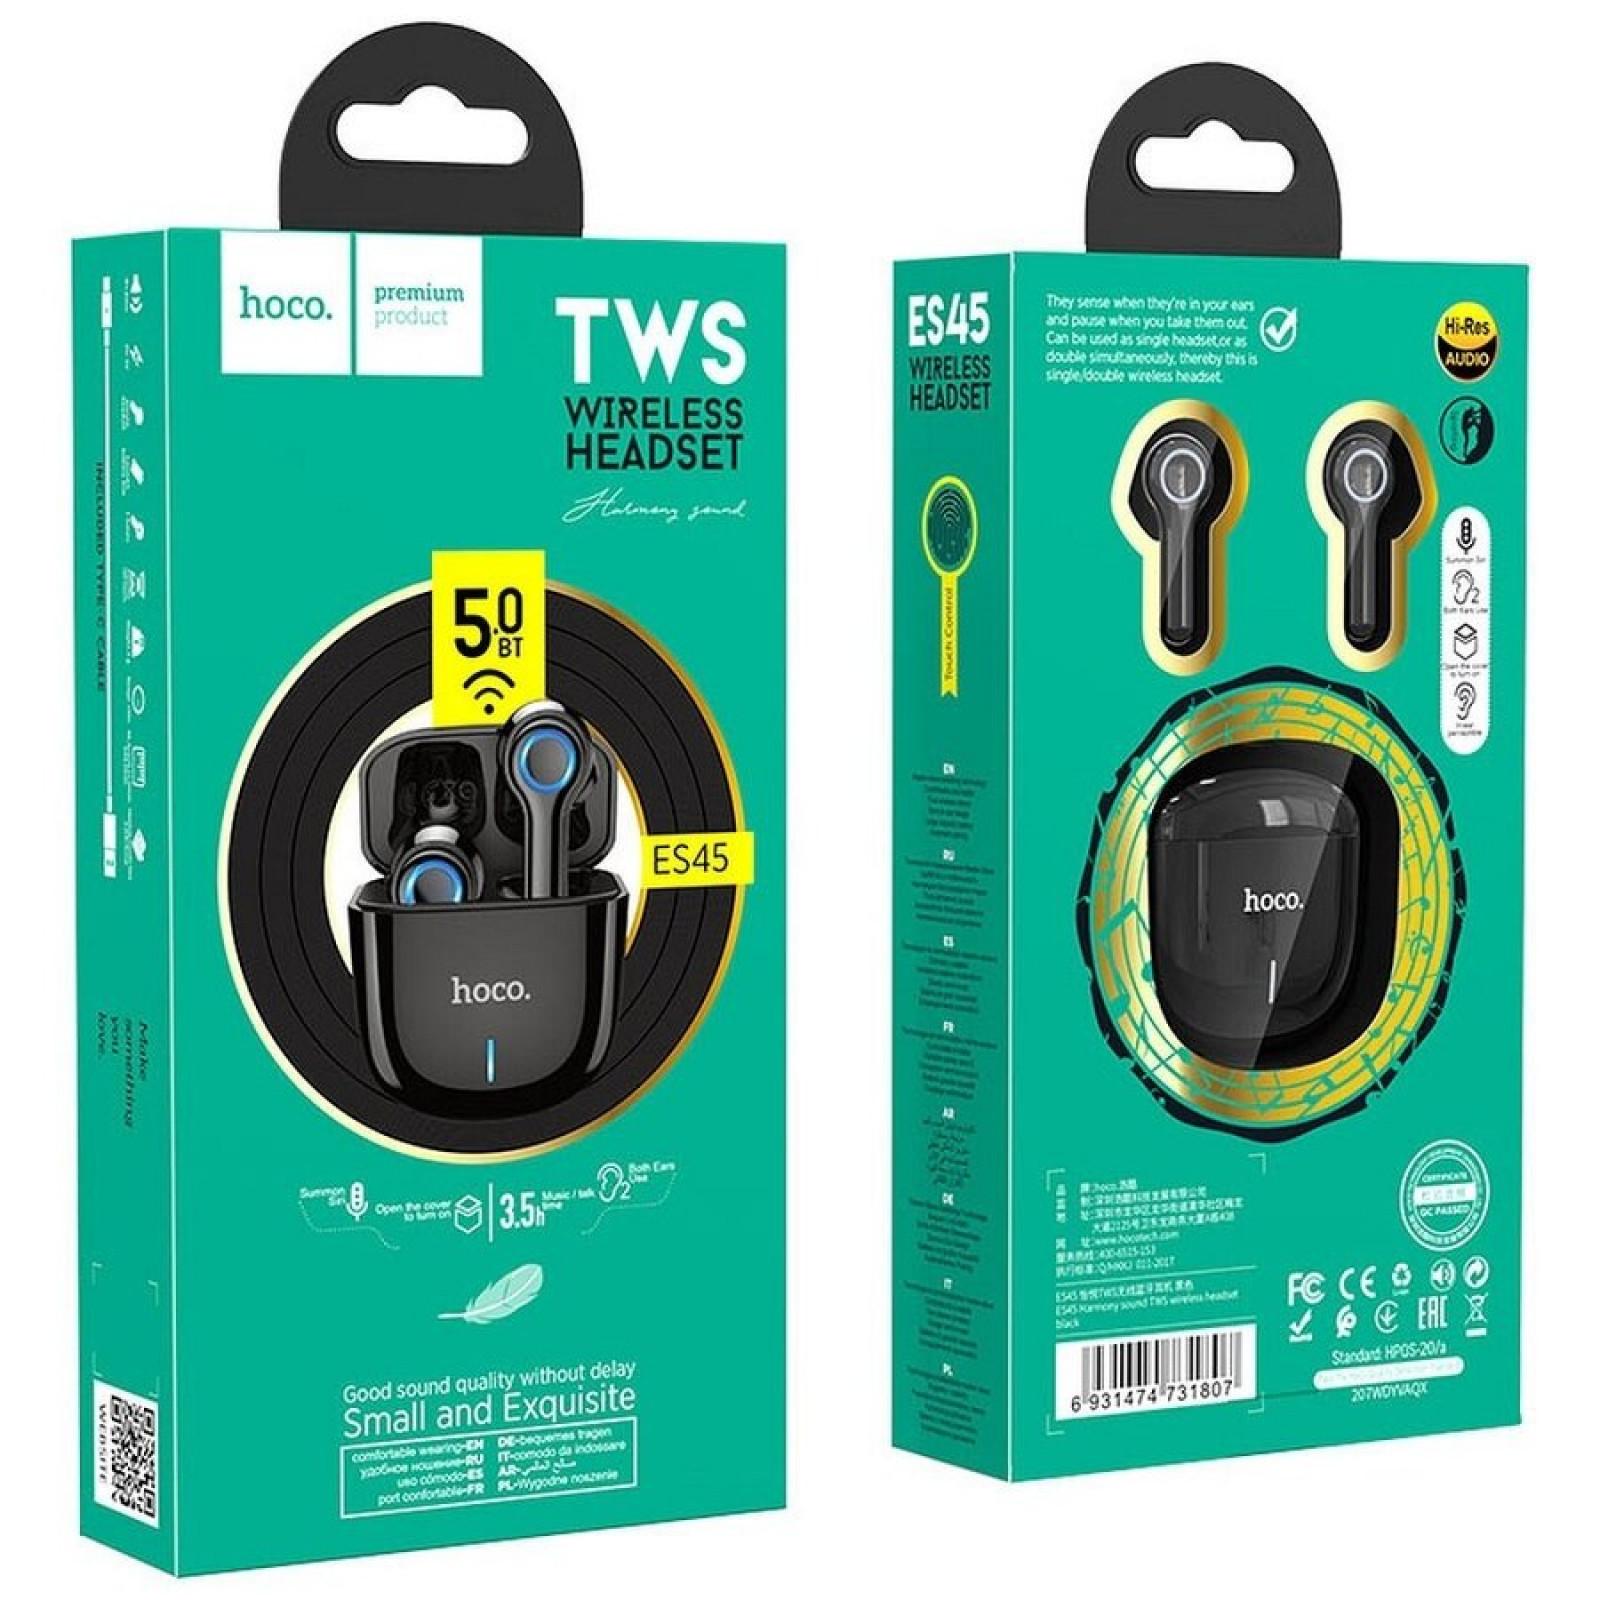 Bluetooth слушалки ES45 Harmony sound TWS wireless headset - Черни